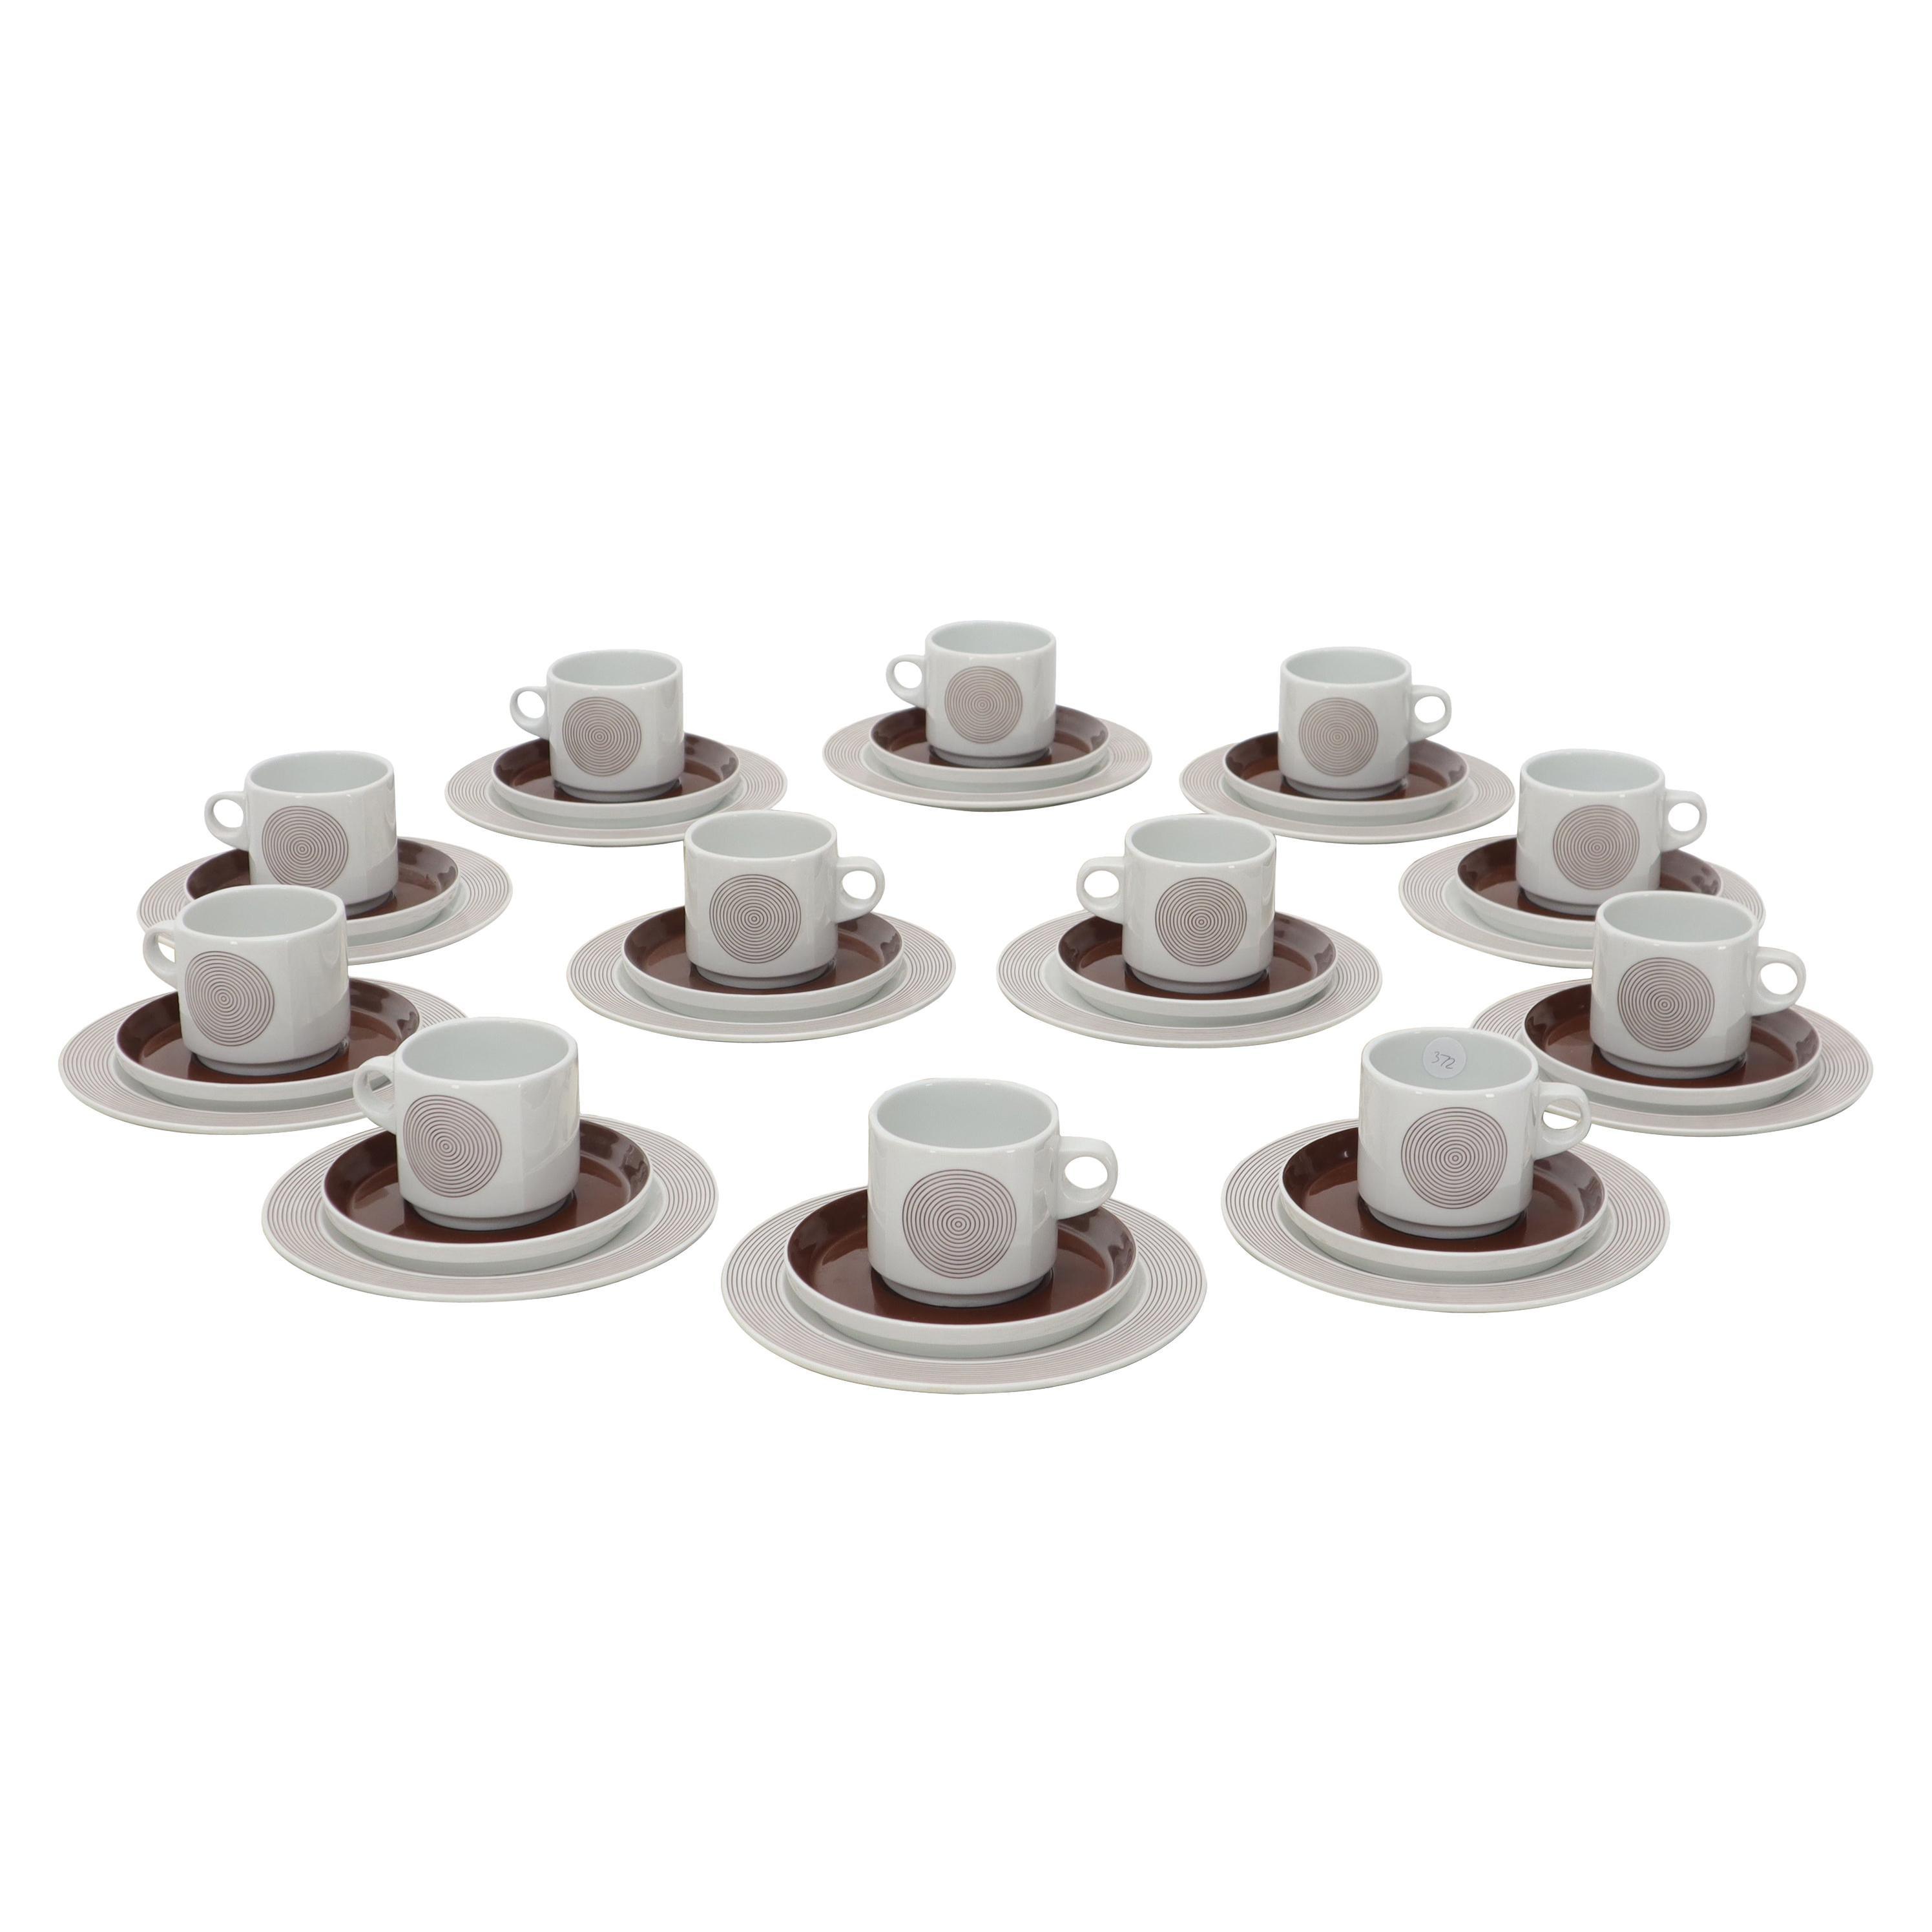 36 Pieces Porcelain Rosenthal Tea Coffee Set for 12